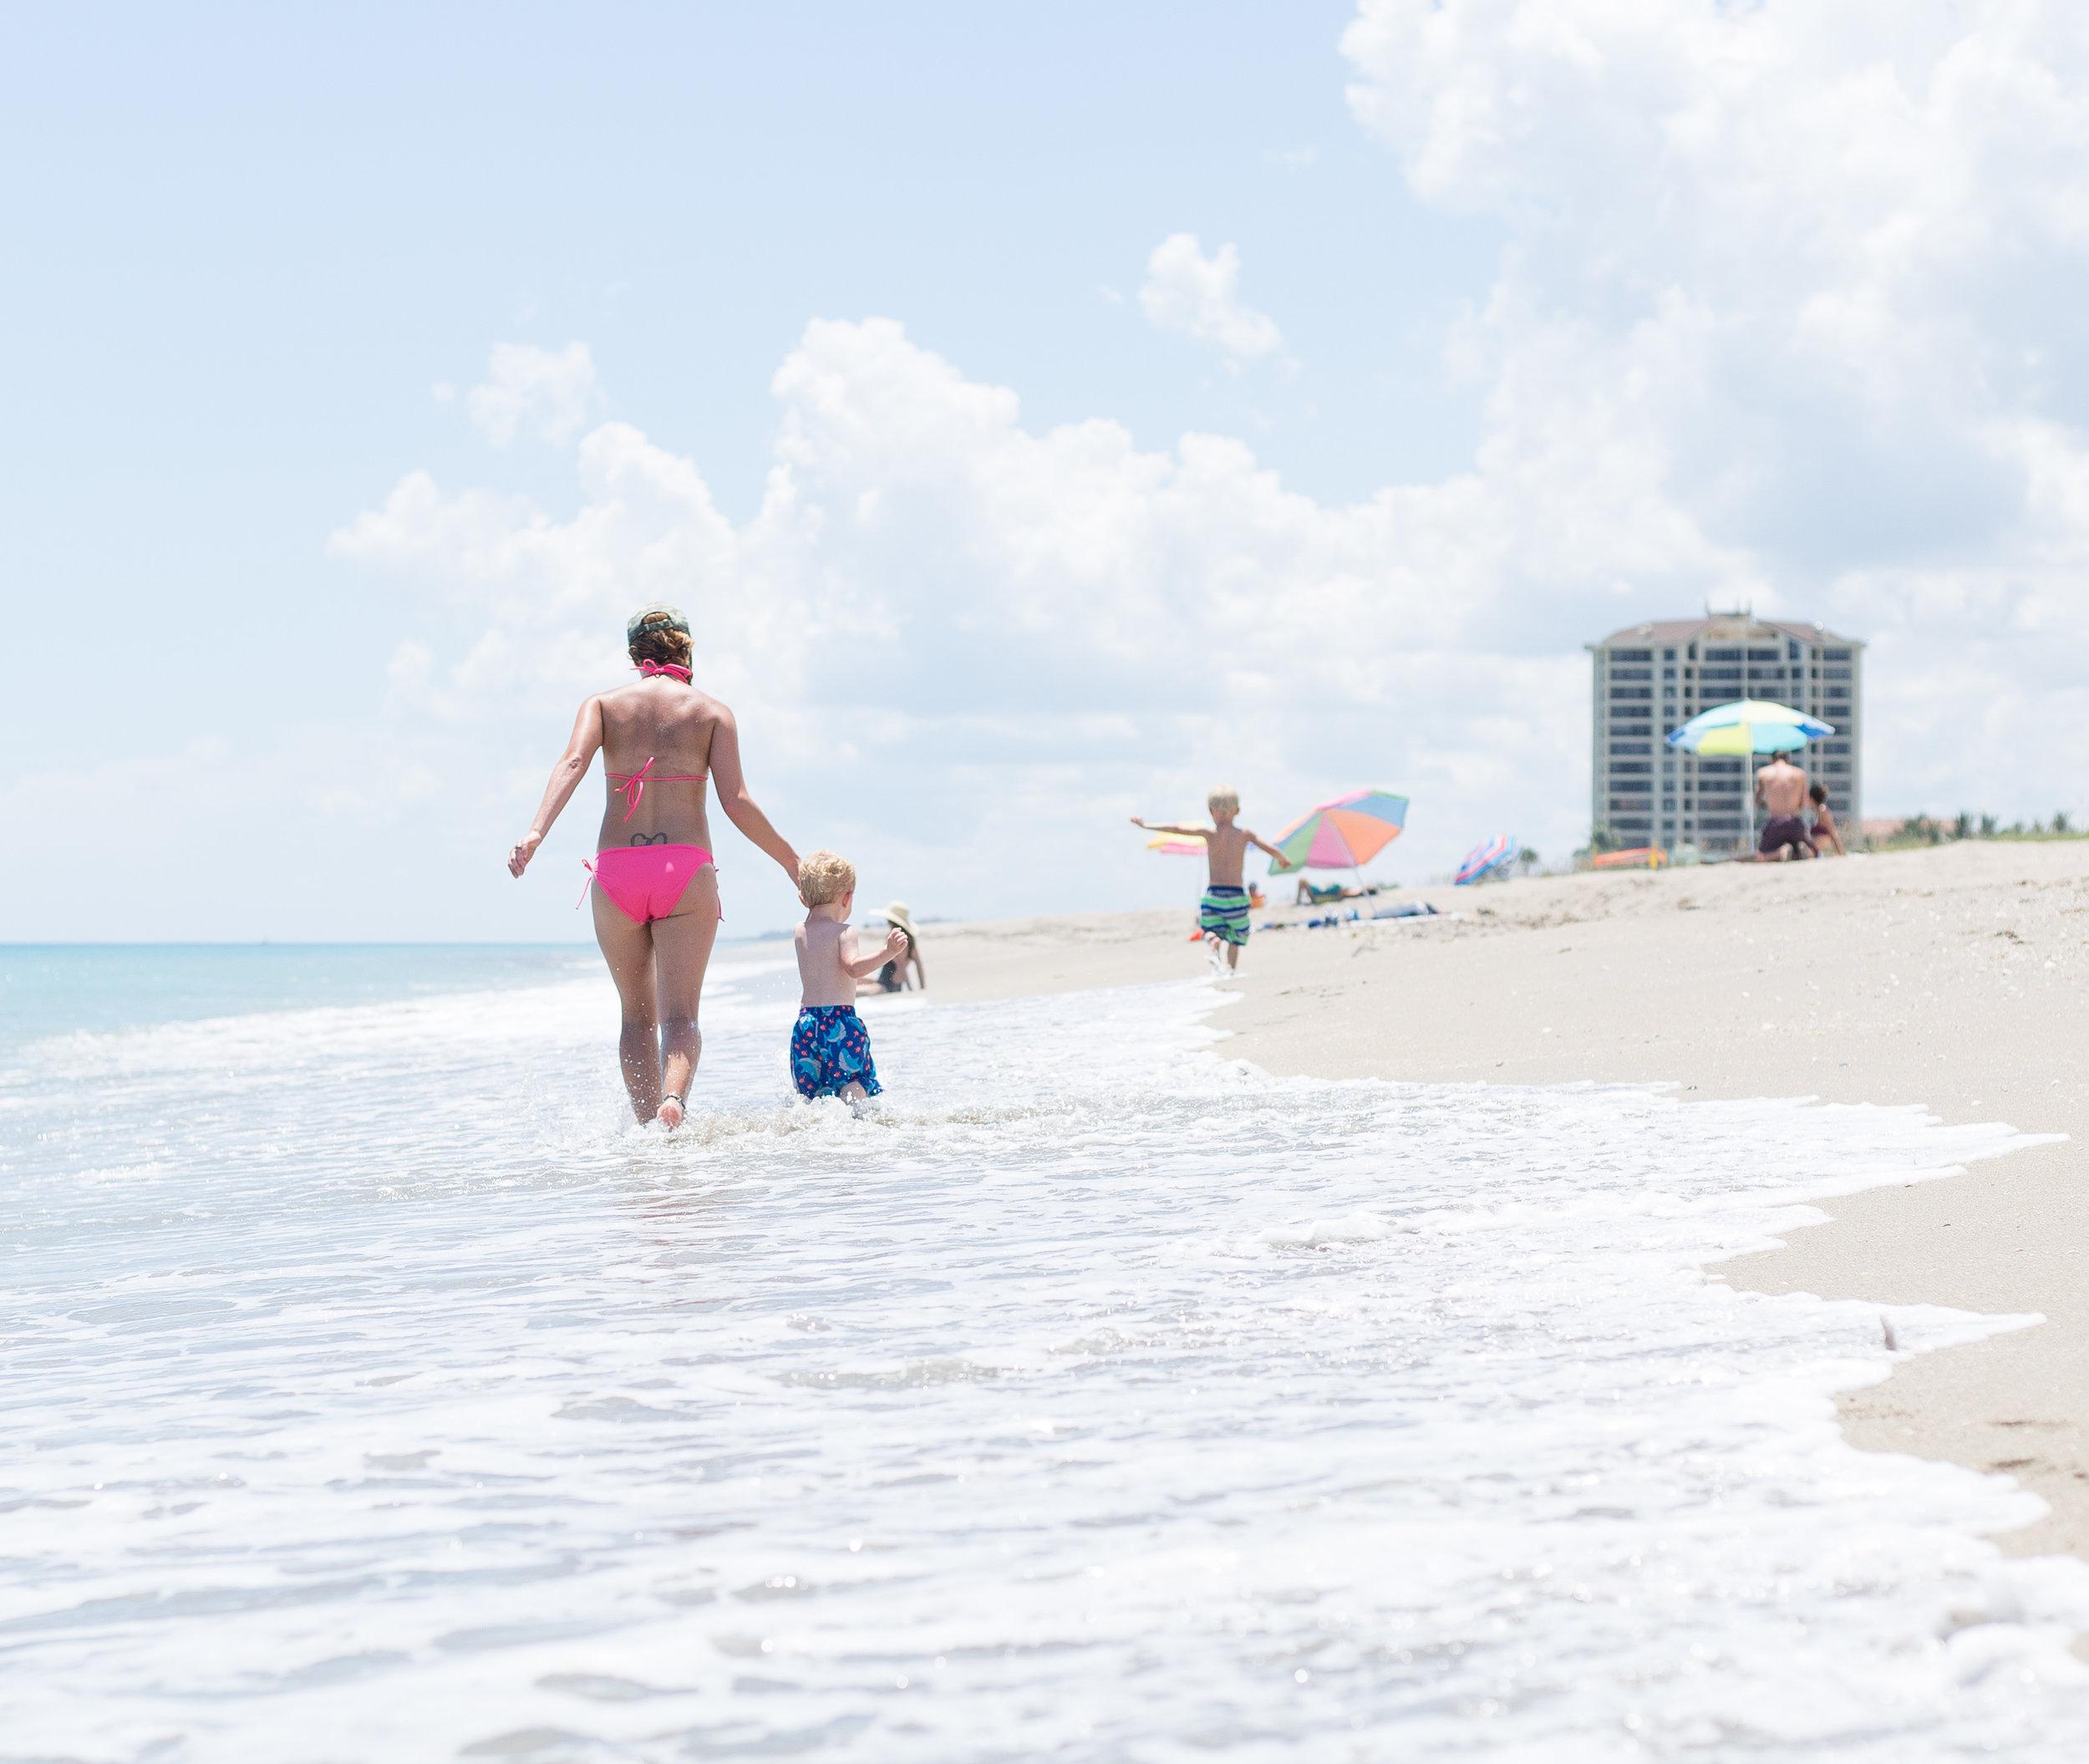 Florida Beach Personal Project-10.jpg